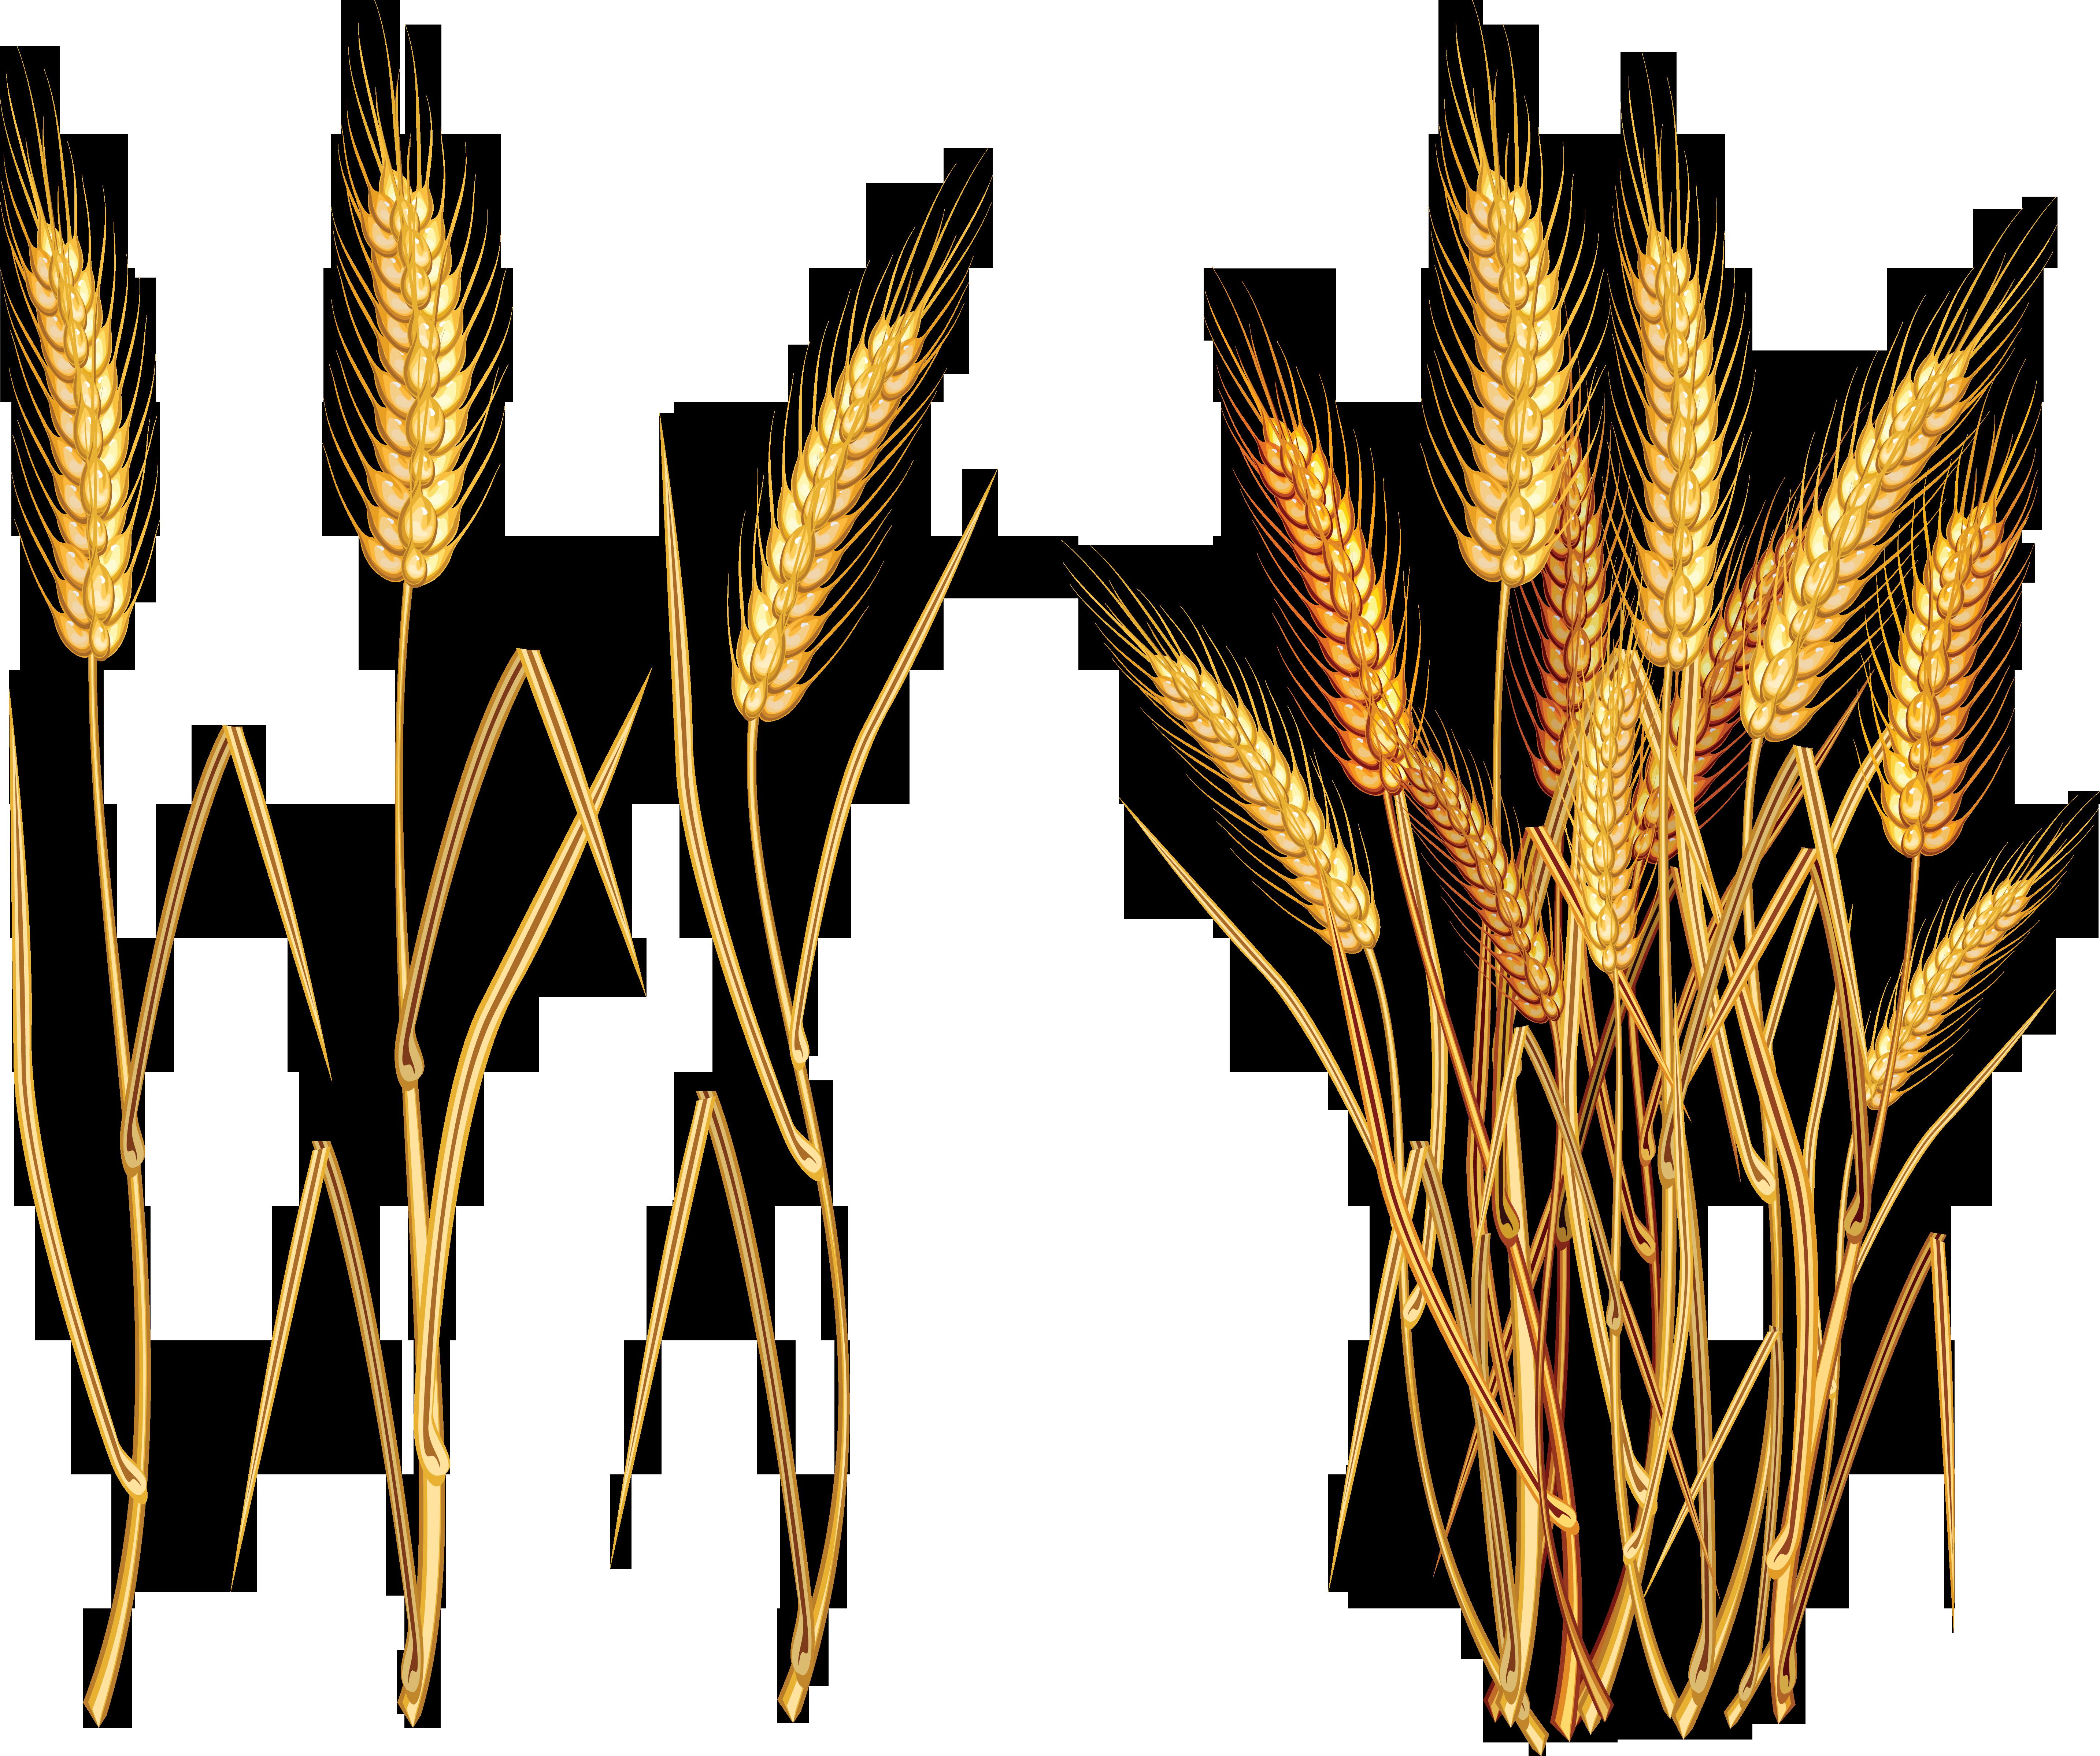 Png tats pinterest. Grains clipart wheat stalk